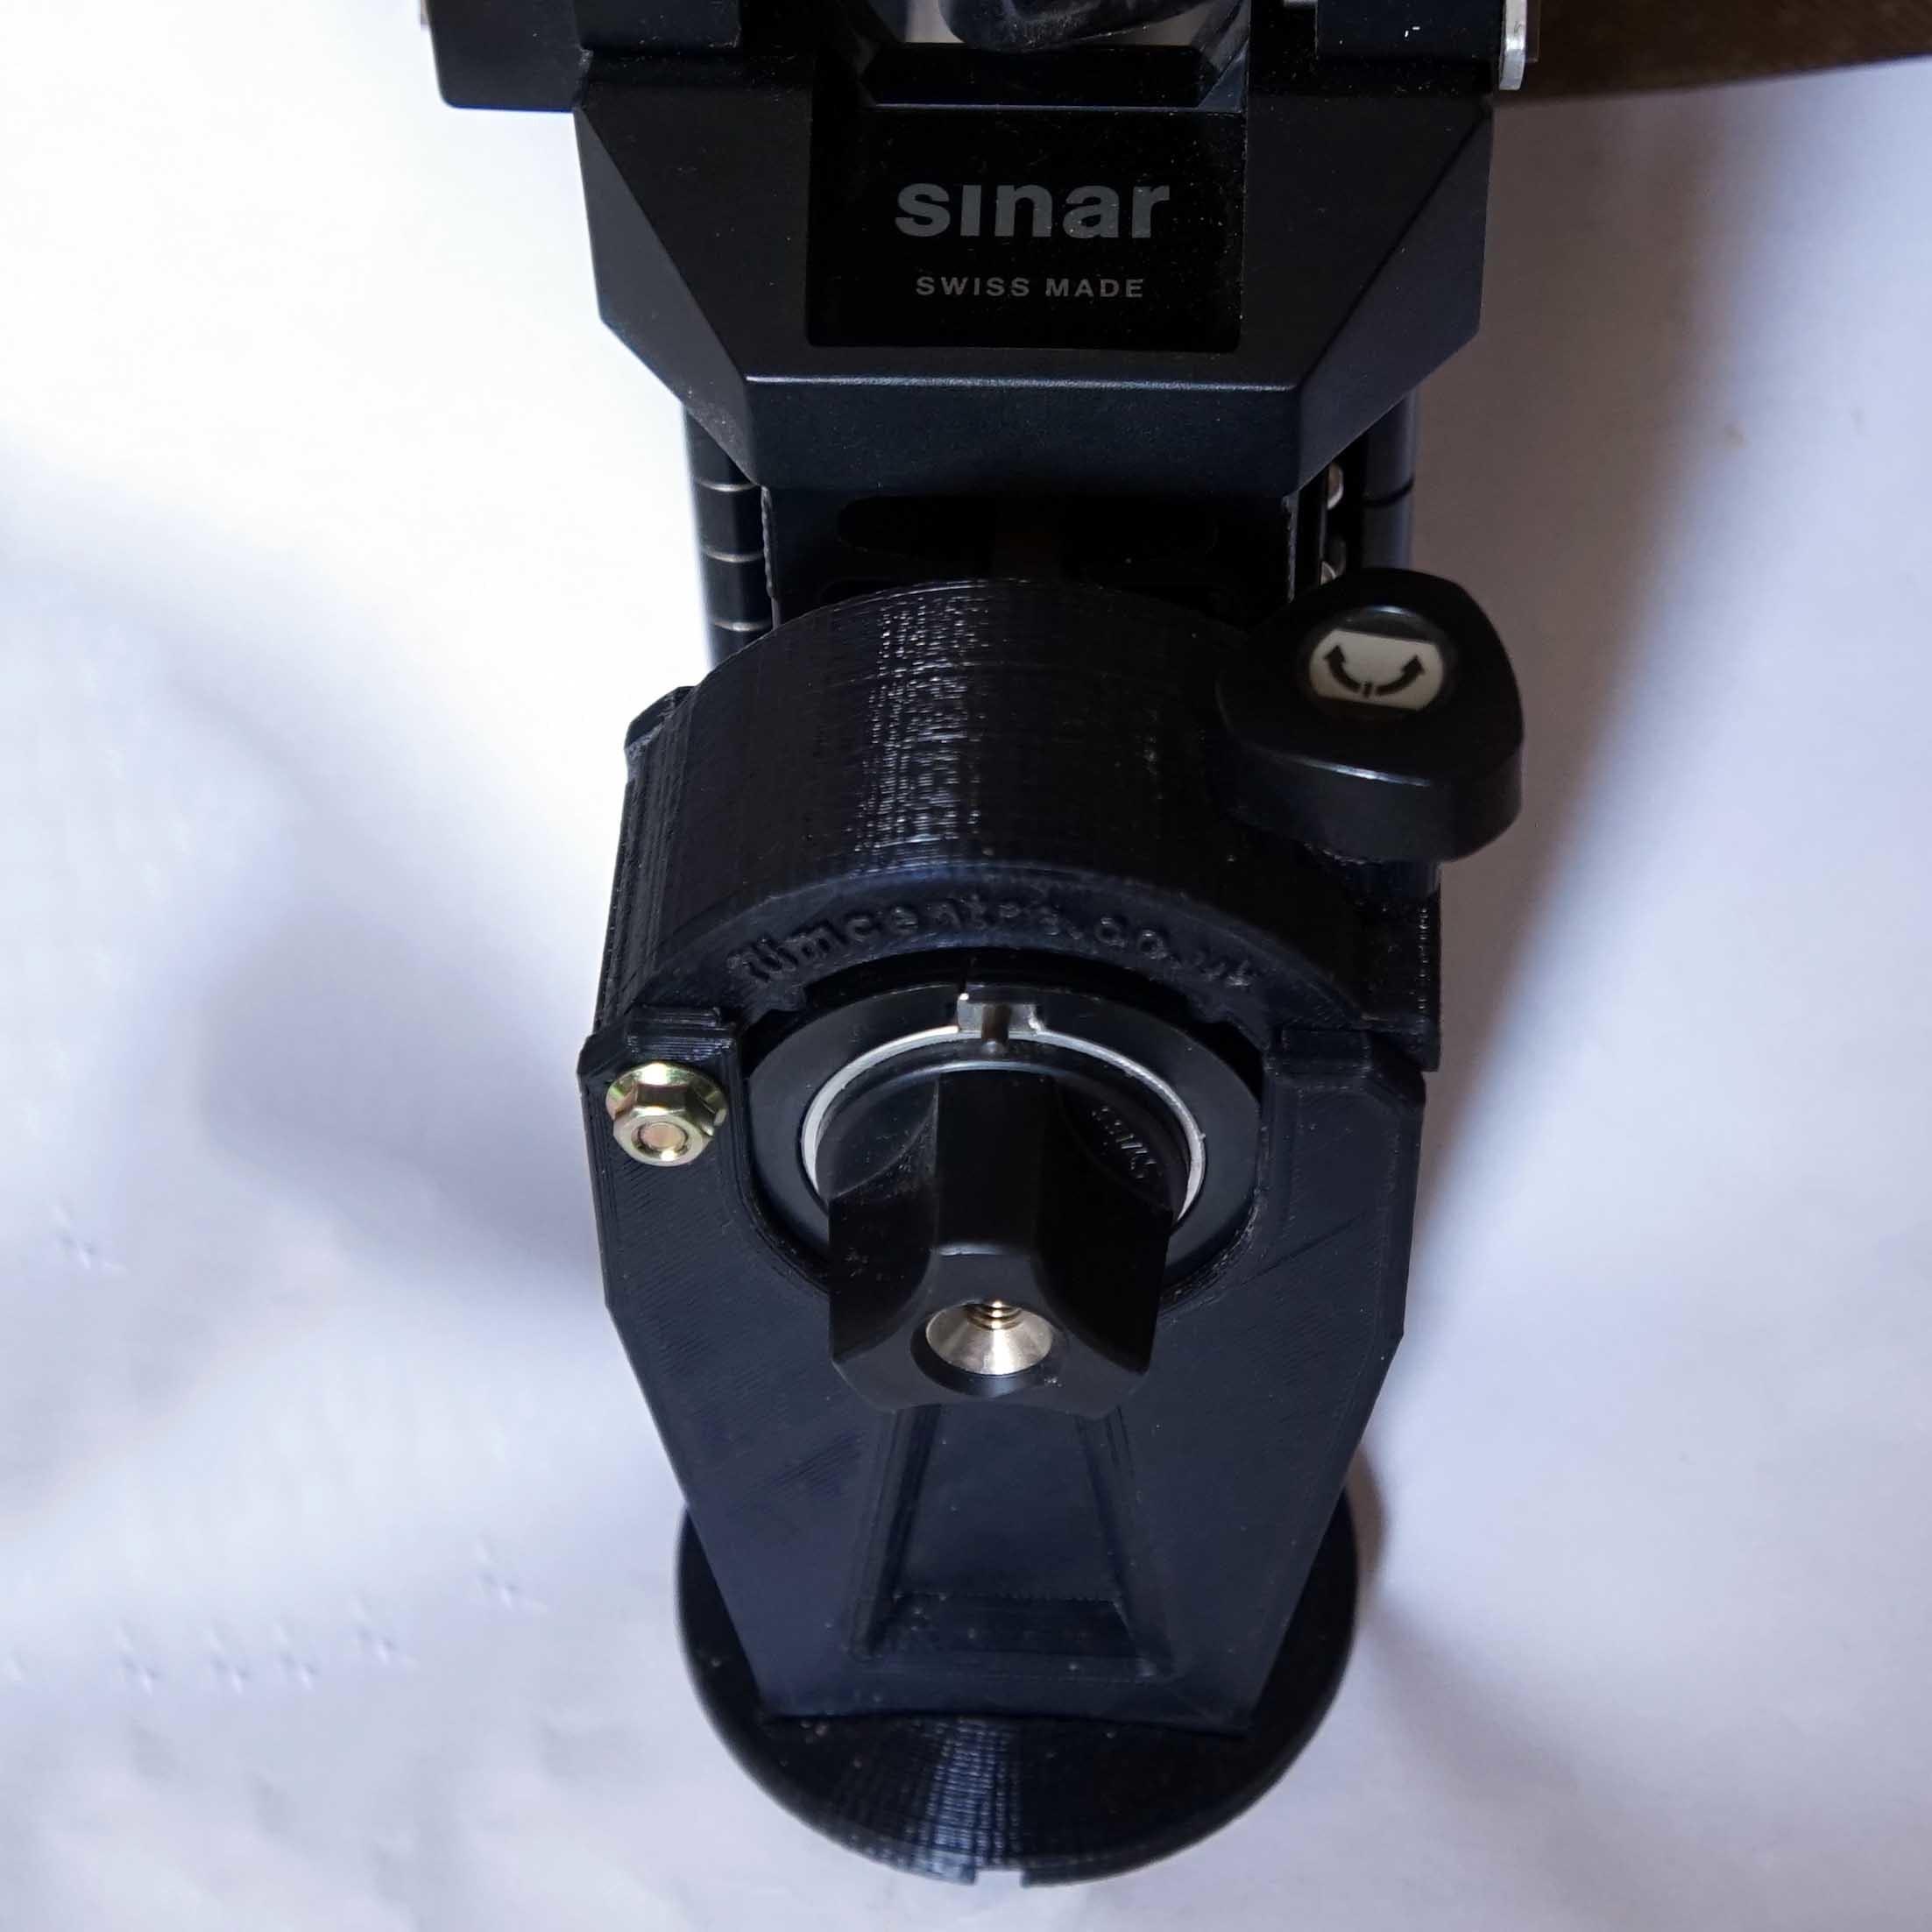 sinar-tripod-mount-pillar0.JPG Download STL file Sinar rail clamp (camera/tripod support) & F1 repairs • 3D printing object, vintage-lens